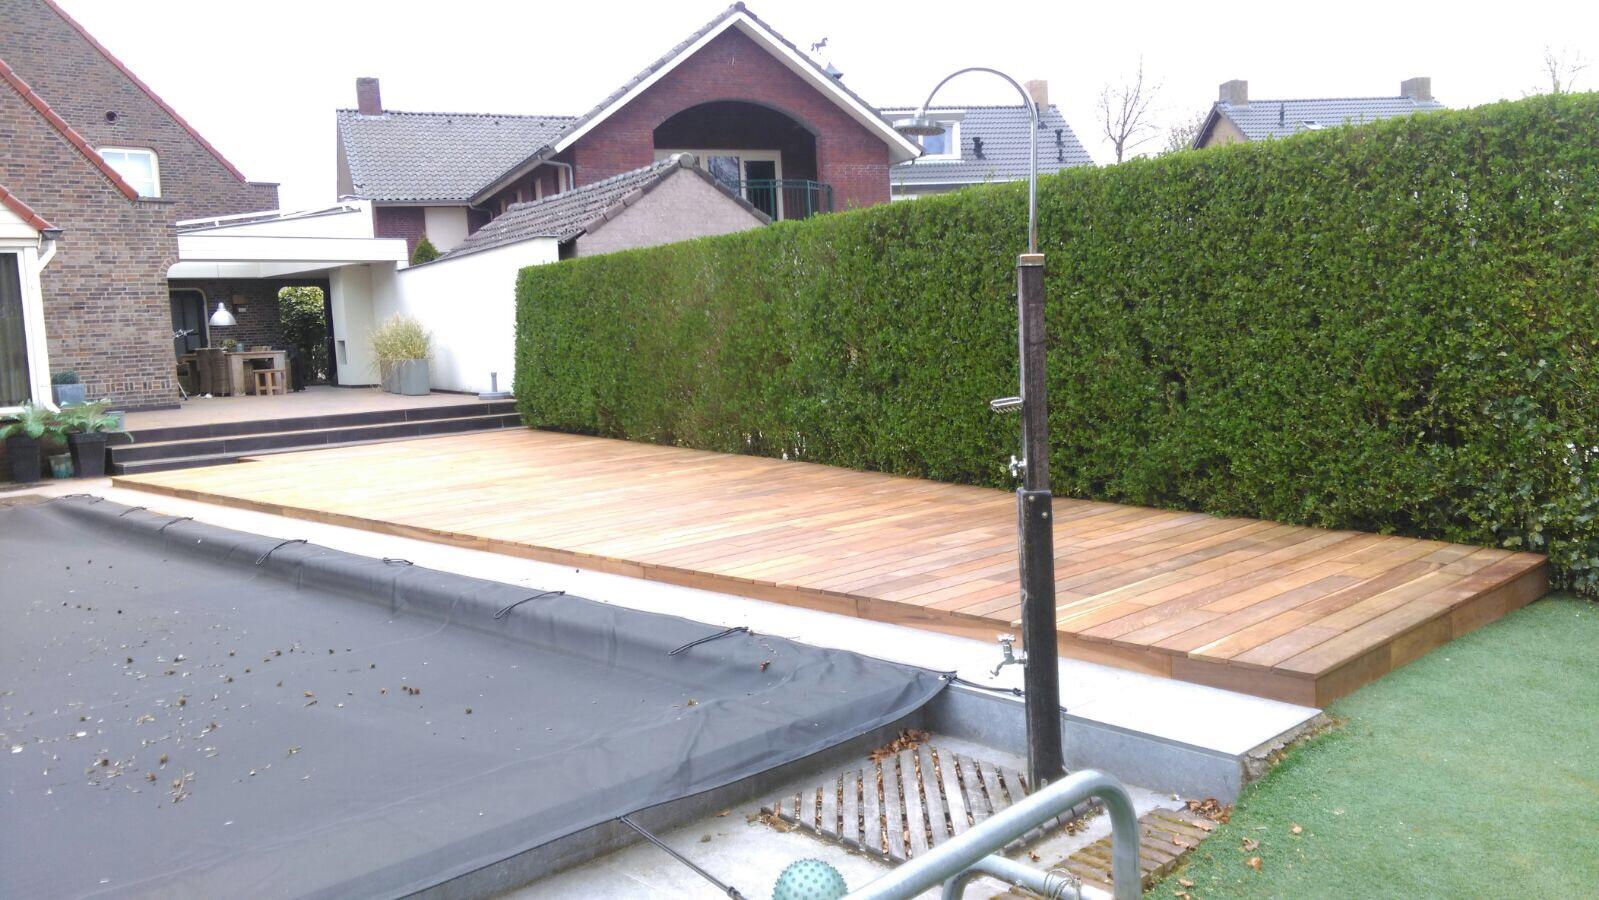 Ipé hout bij Tuinhoutdiscount.nl